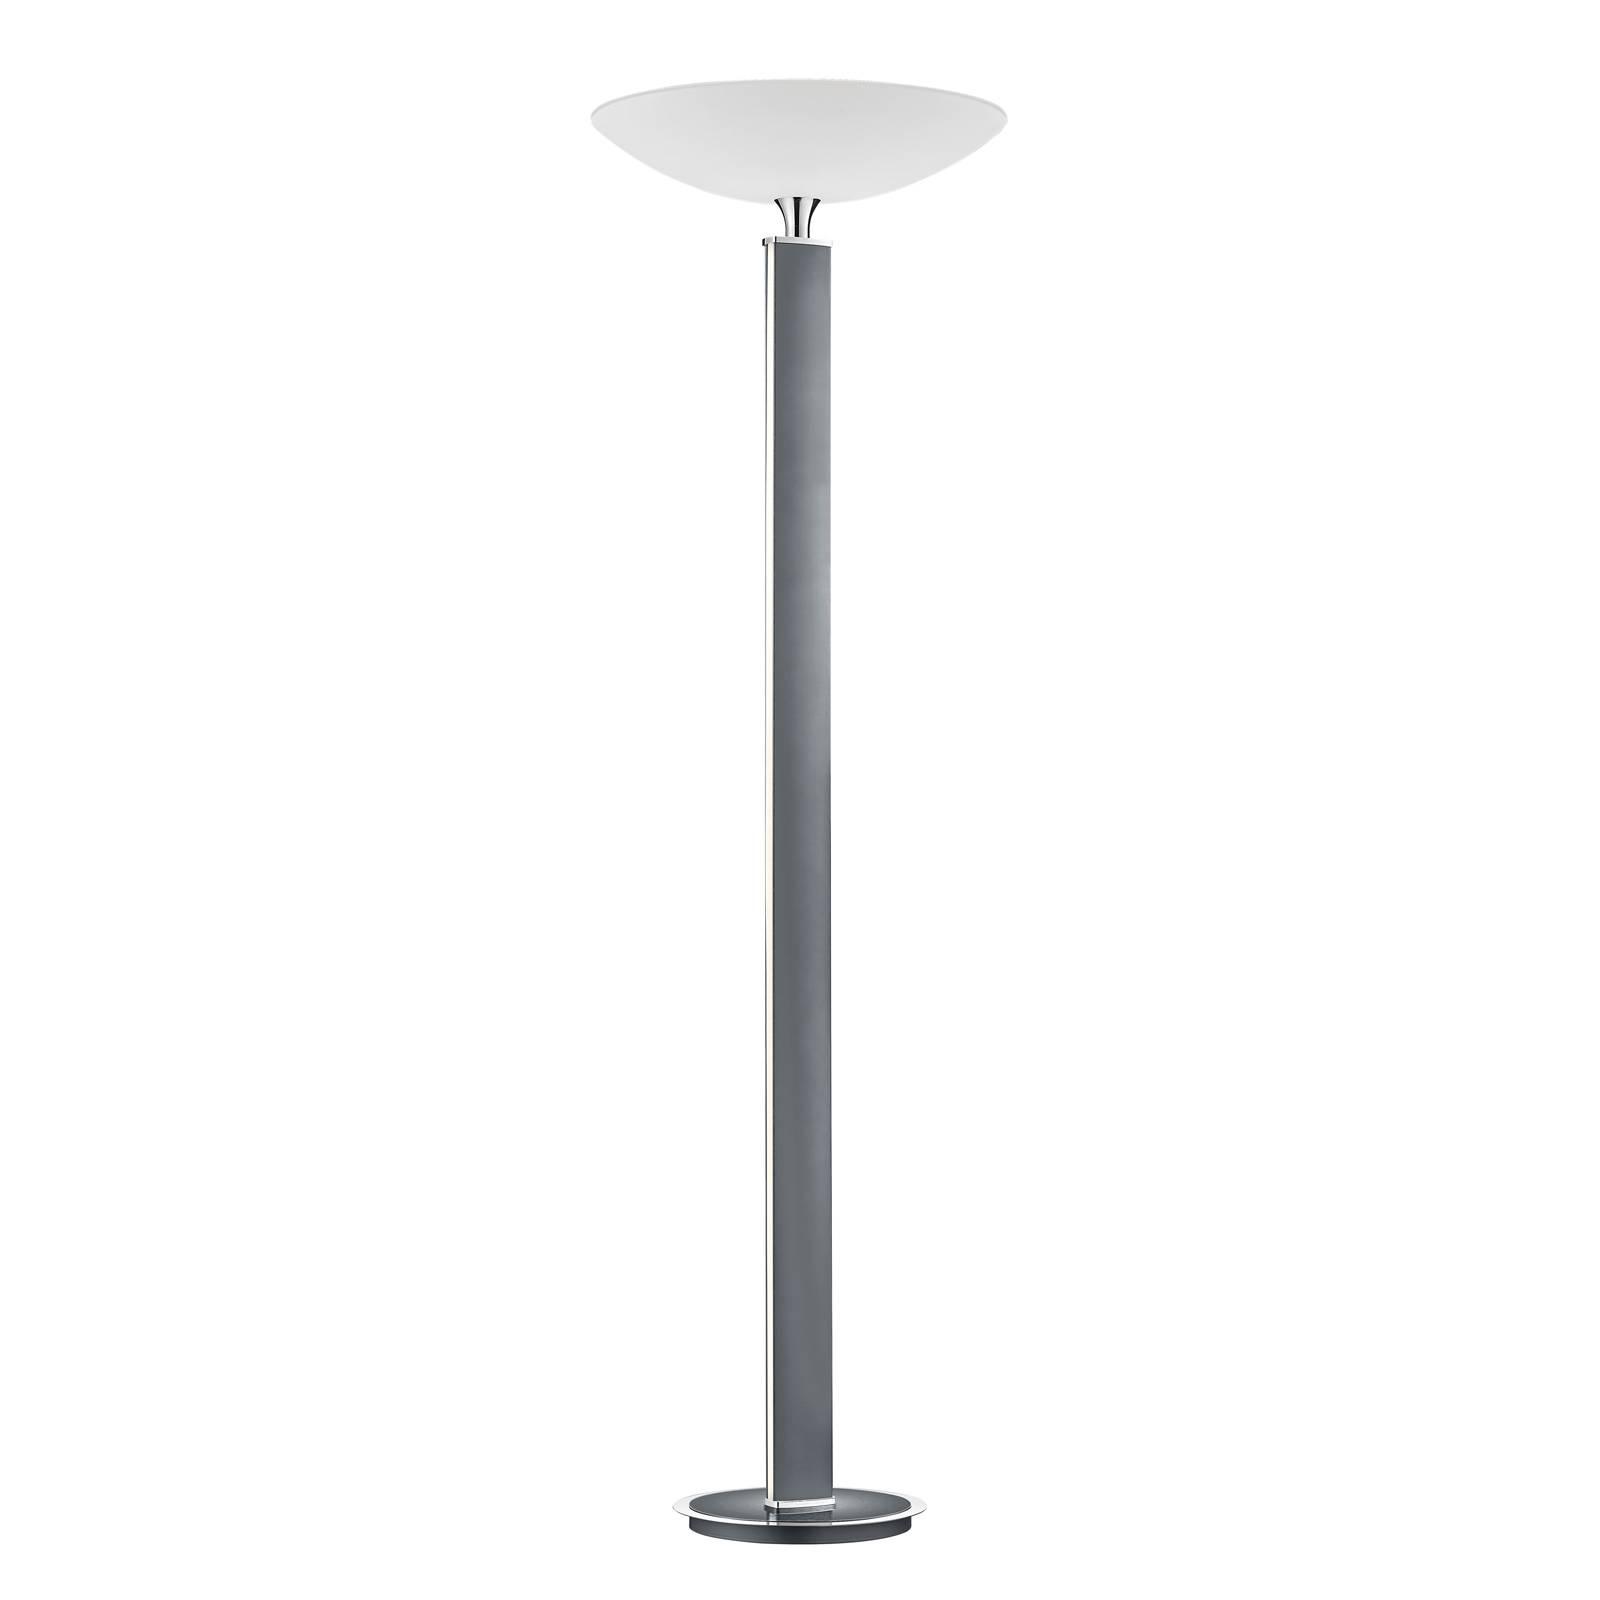 BANKAMP Pure F lampa oświetlająca sufit antracyt